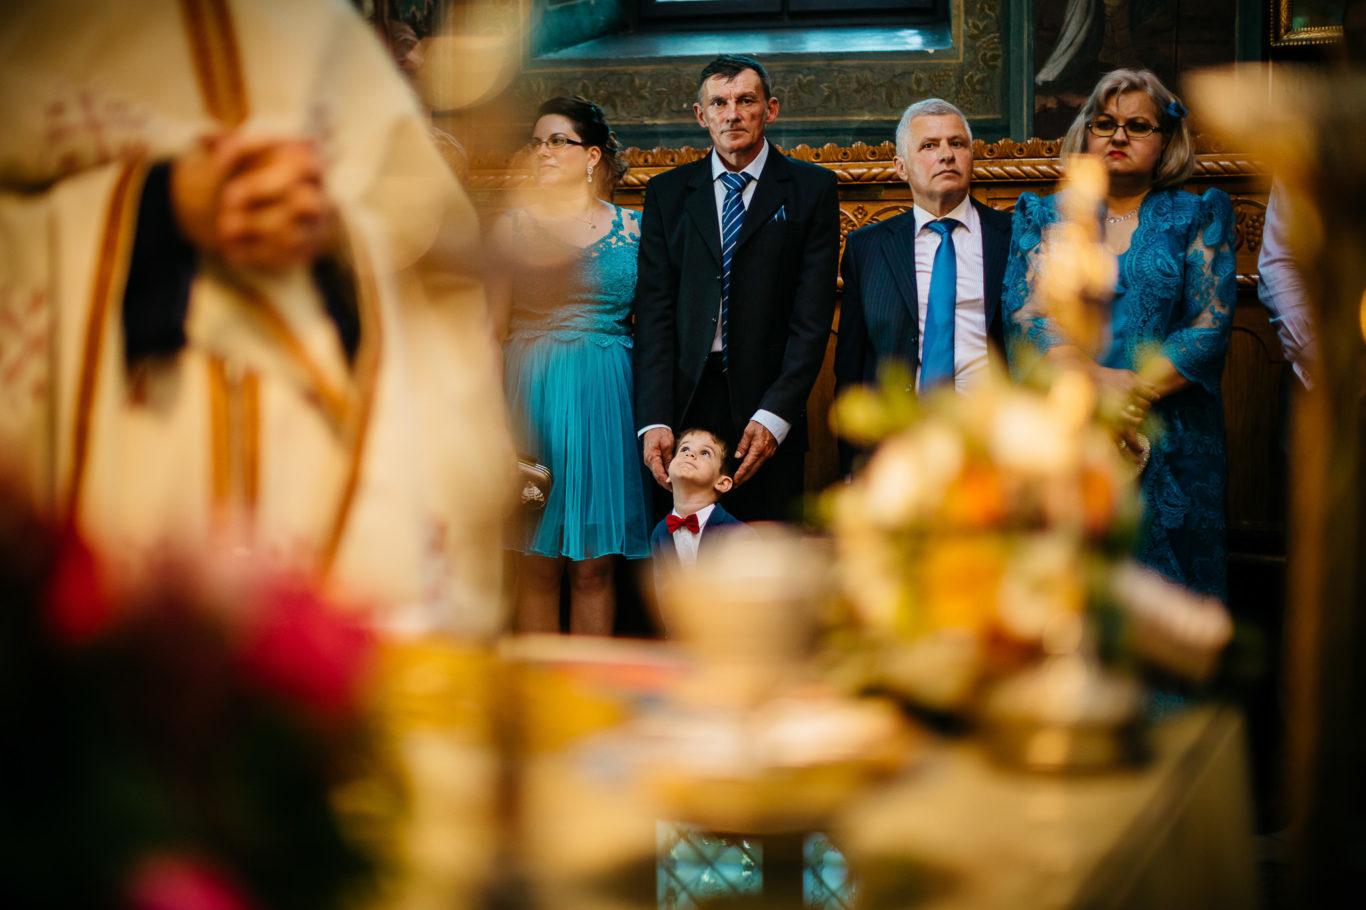 0291-Fotografie-nunta-Bucuresti-Oana-Catalin-fotograf-Ciprian-Dumitrescu-CDF_0424